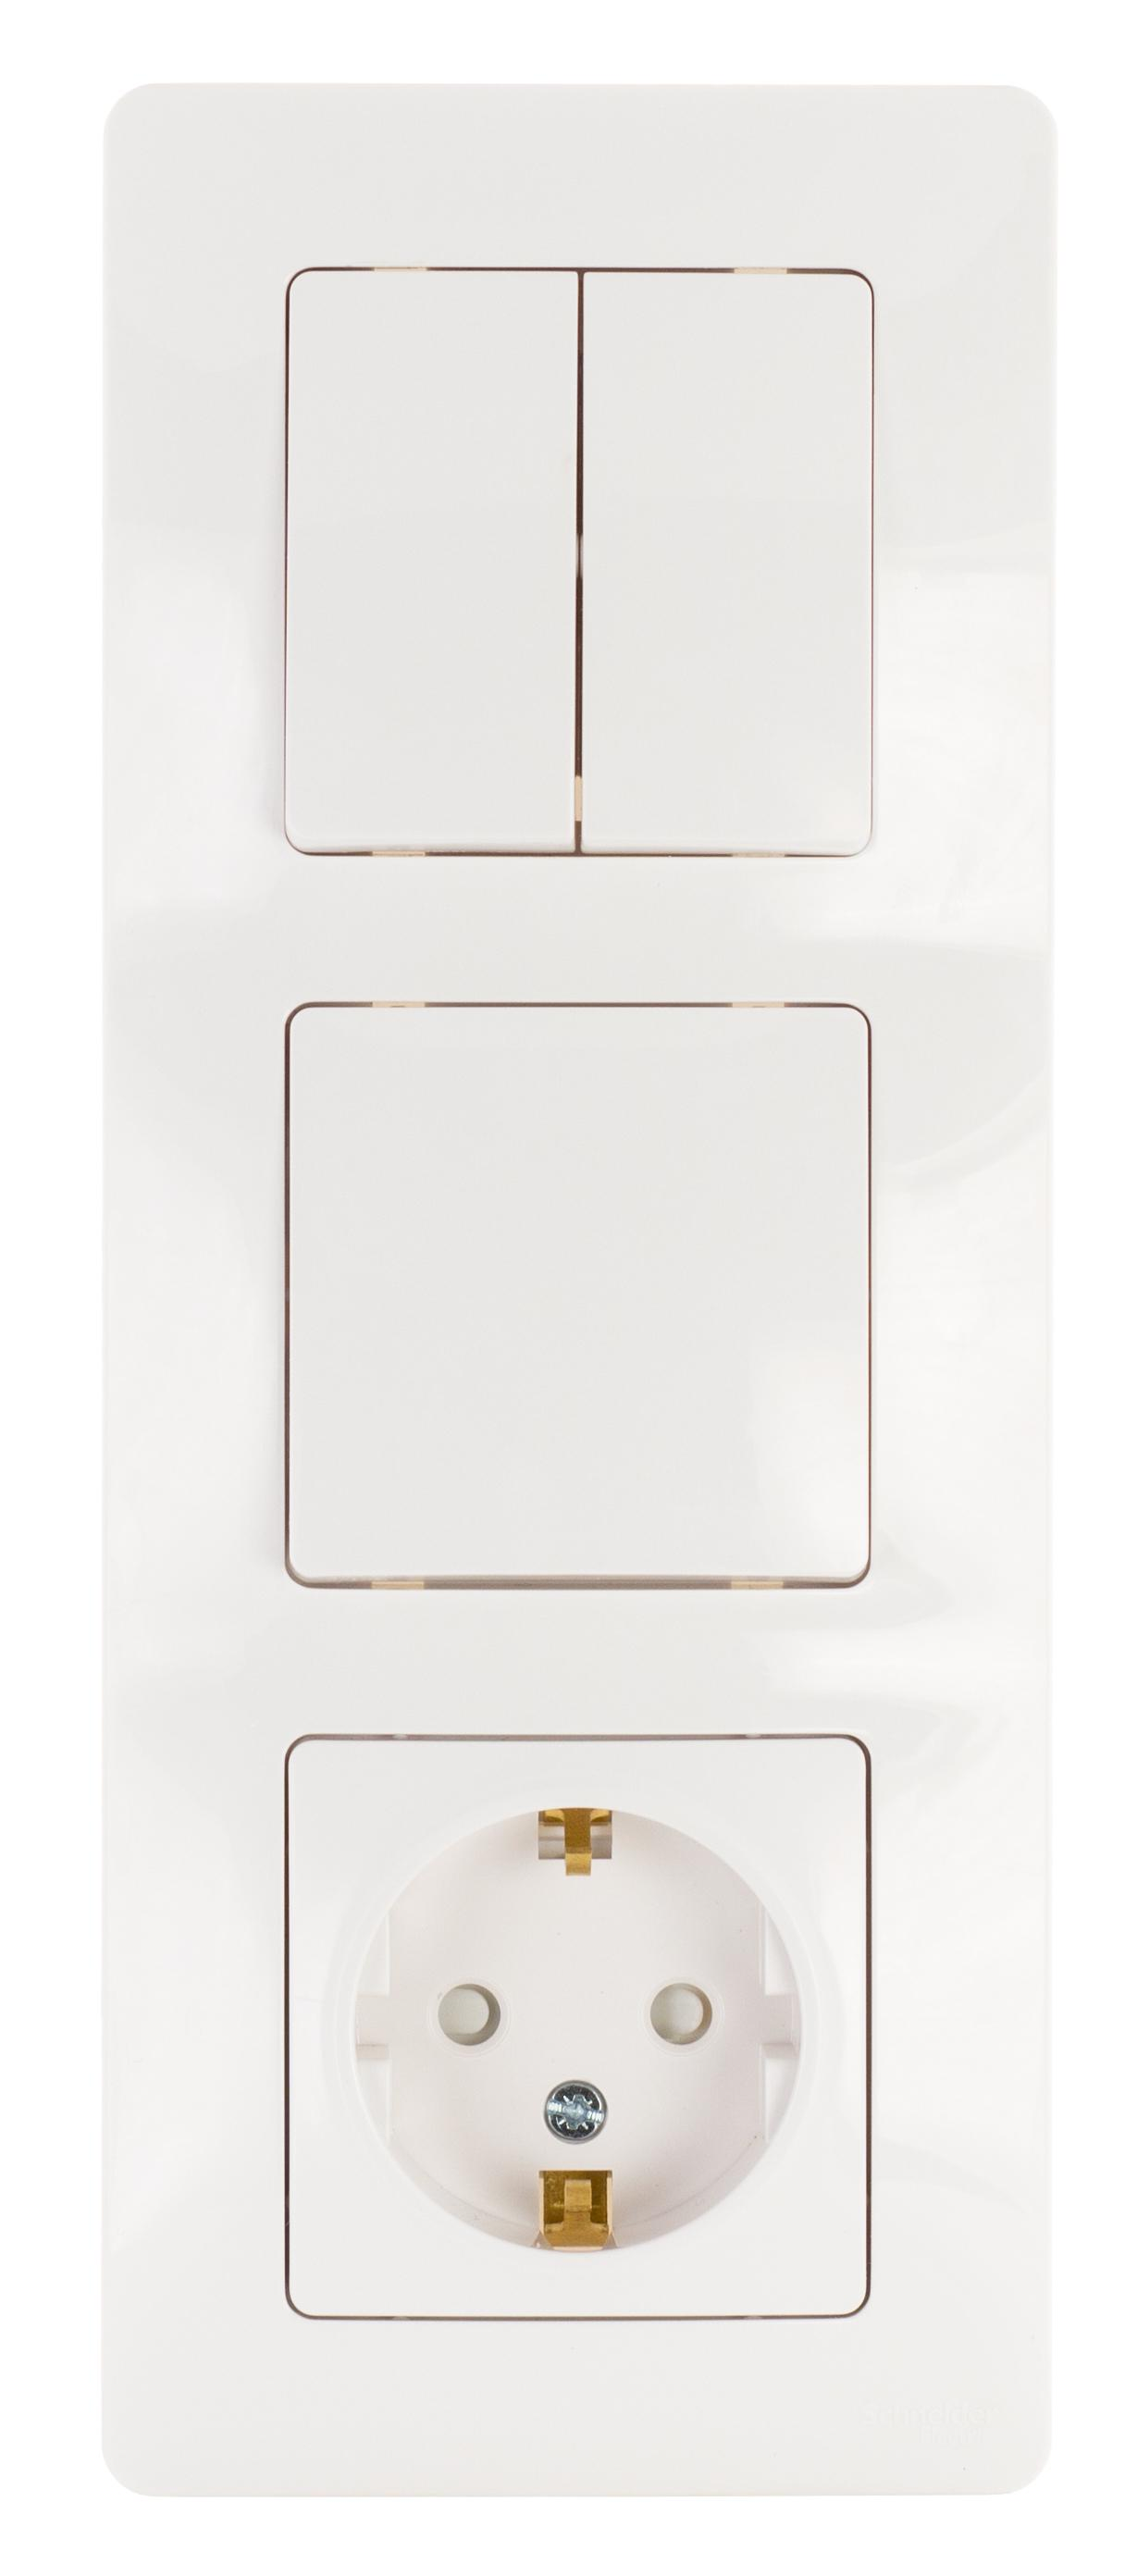 Блок Schneider electric Blnbs101201 blanca панель лицевая schneider electric actassi 1 модуль белый 24 шт vdi88240